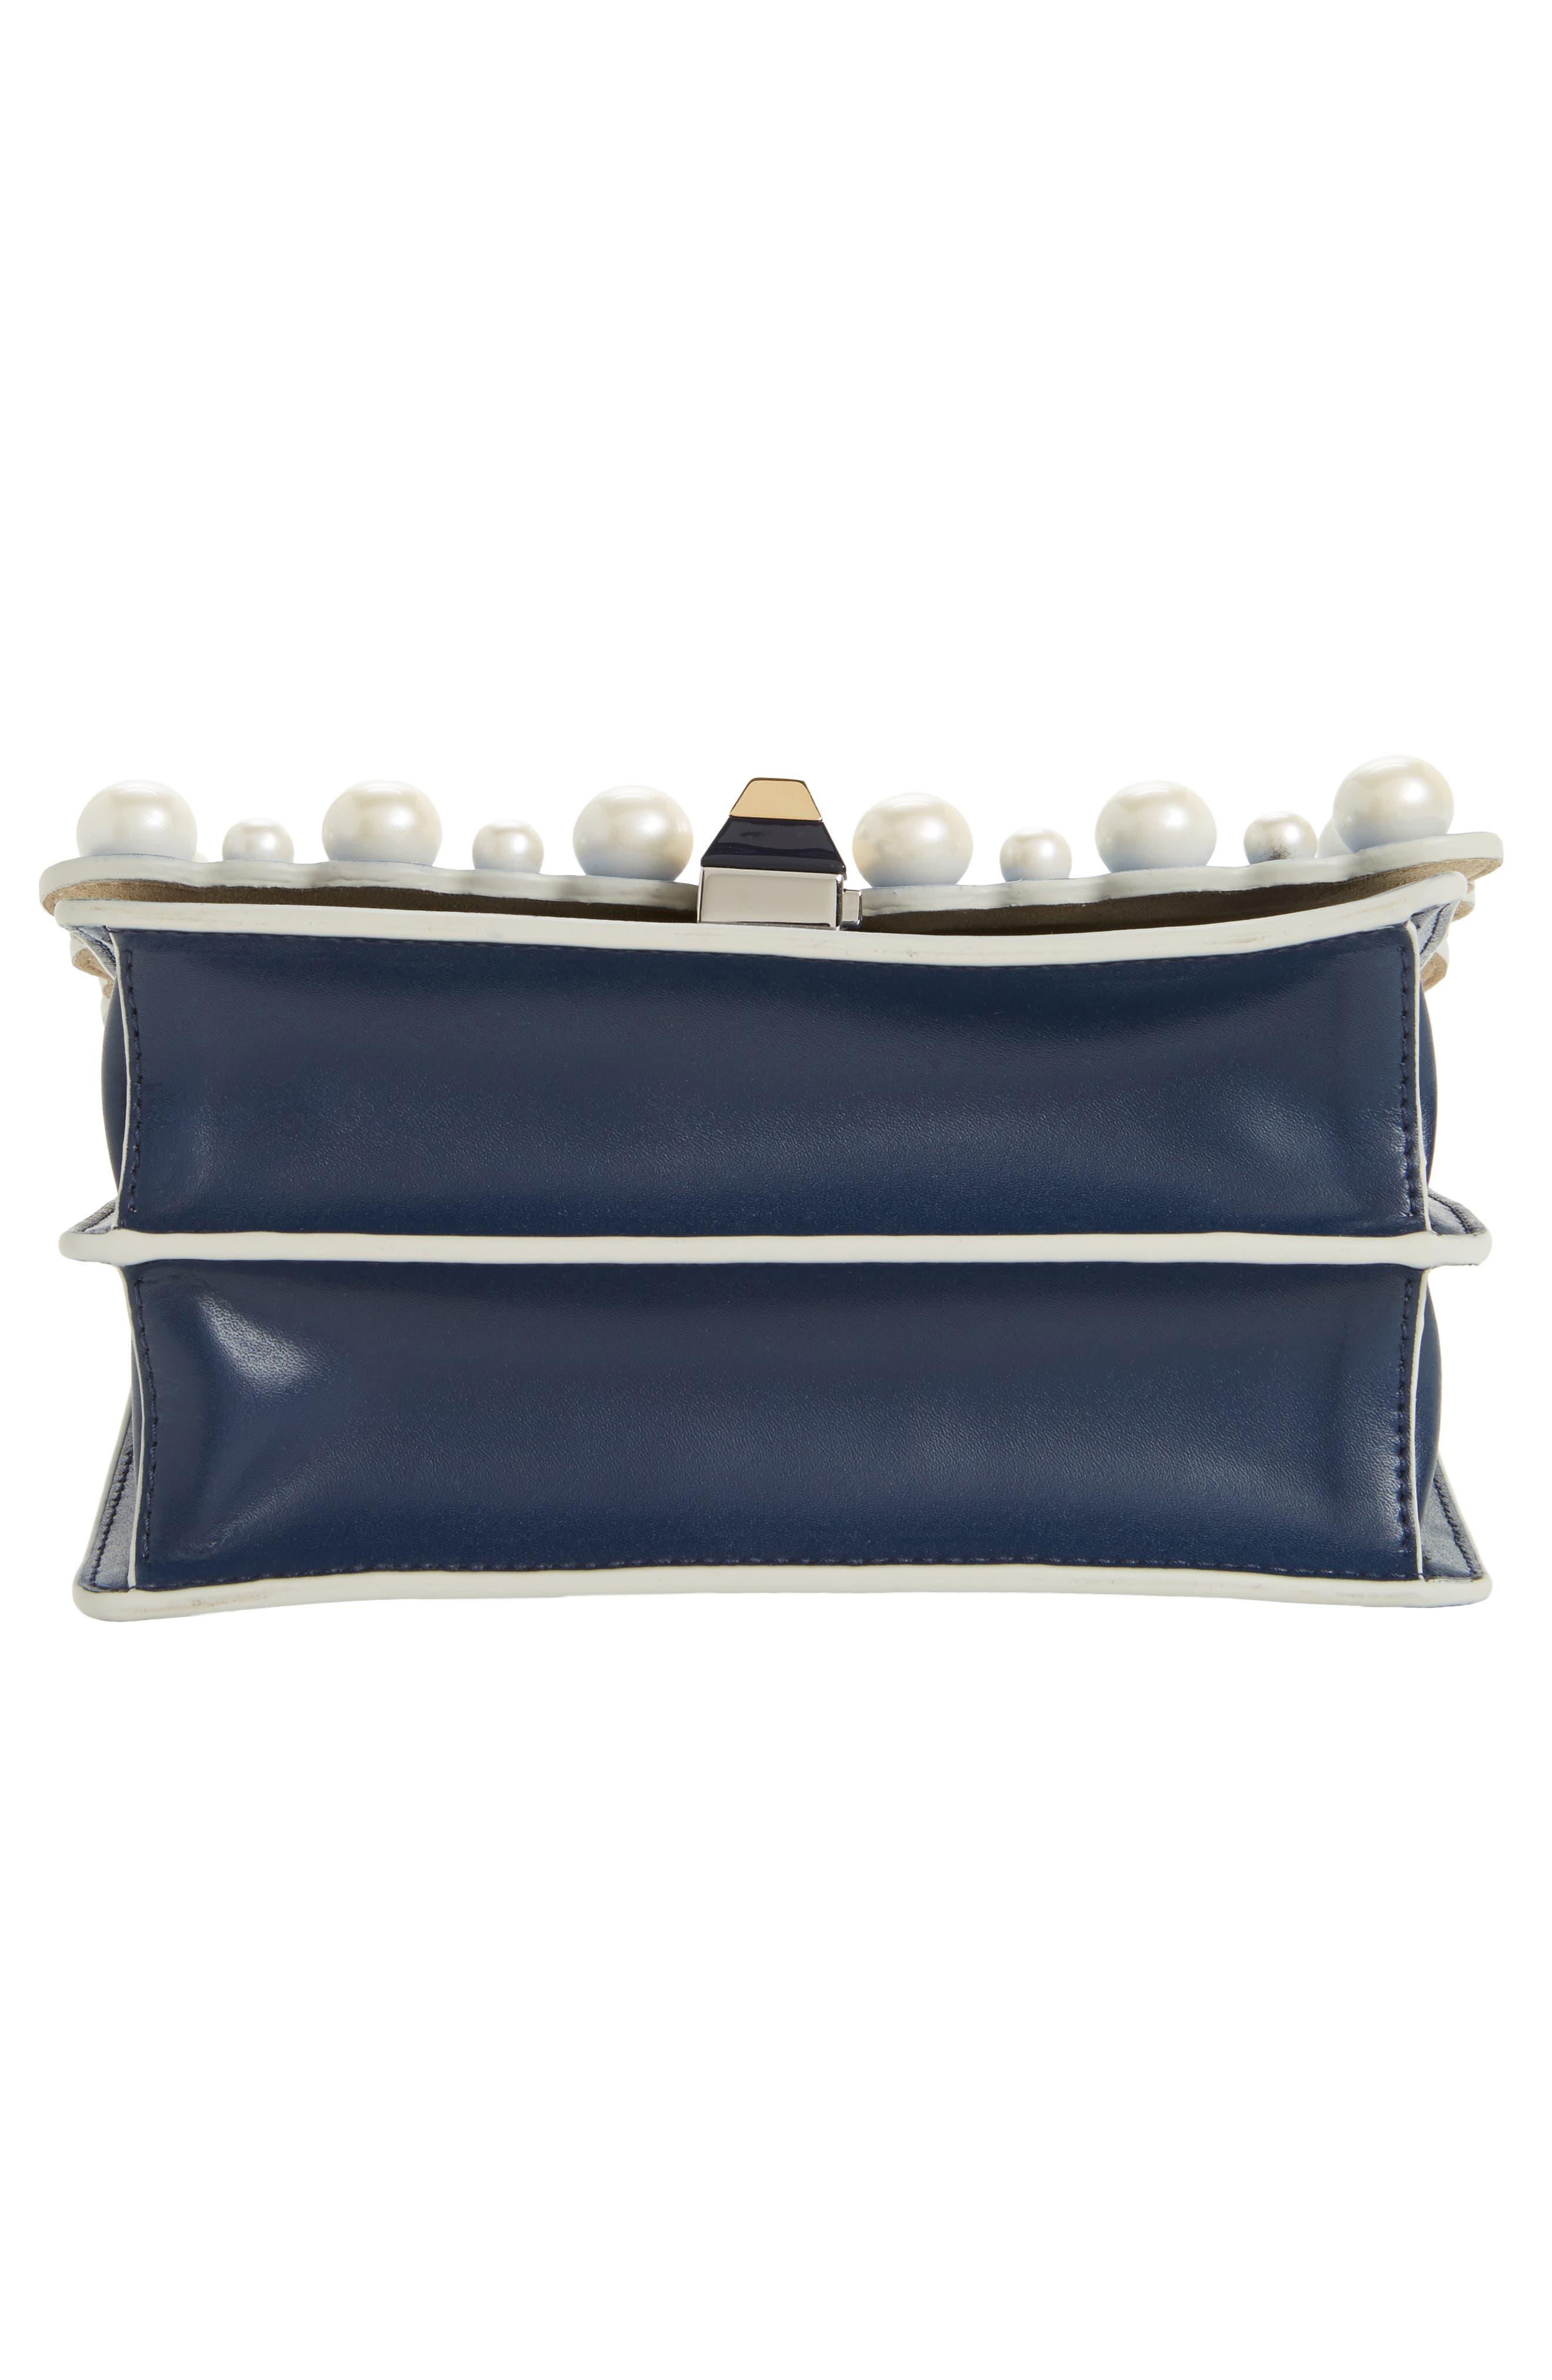 Mini Kan I Imitation Pearl Scallop Leather Shoulder Bag,                             Alternate thumbnail 6, color,                             BLUE